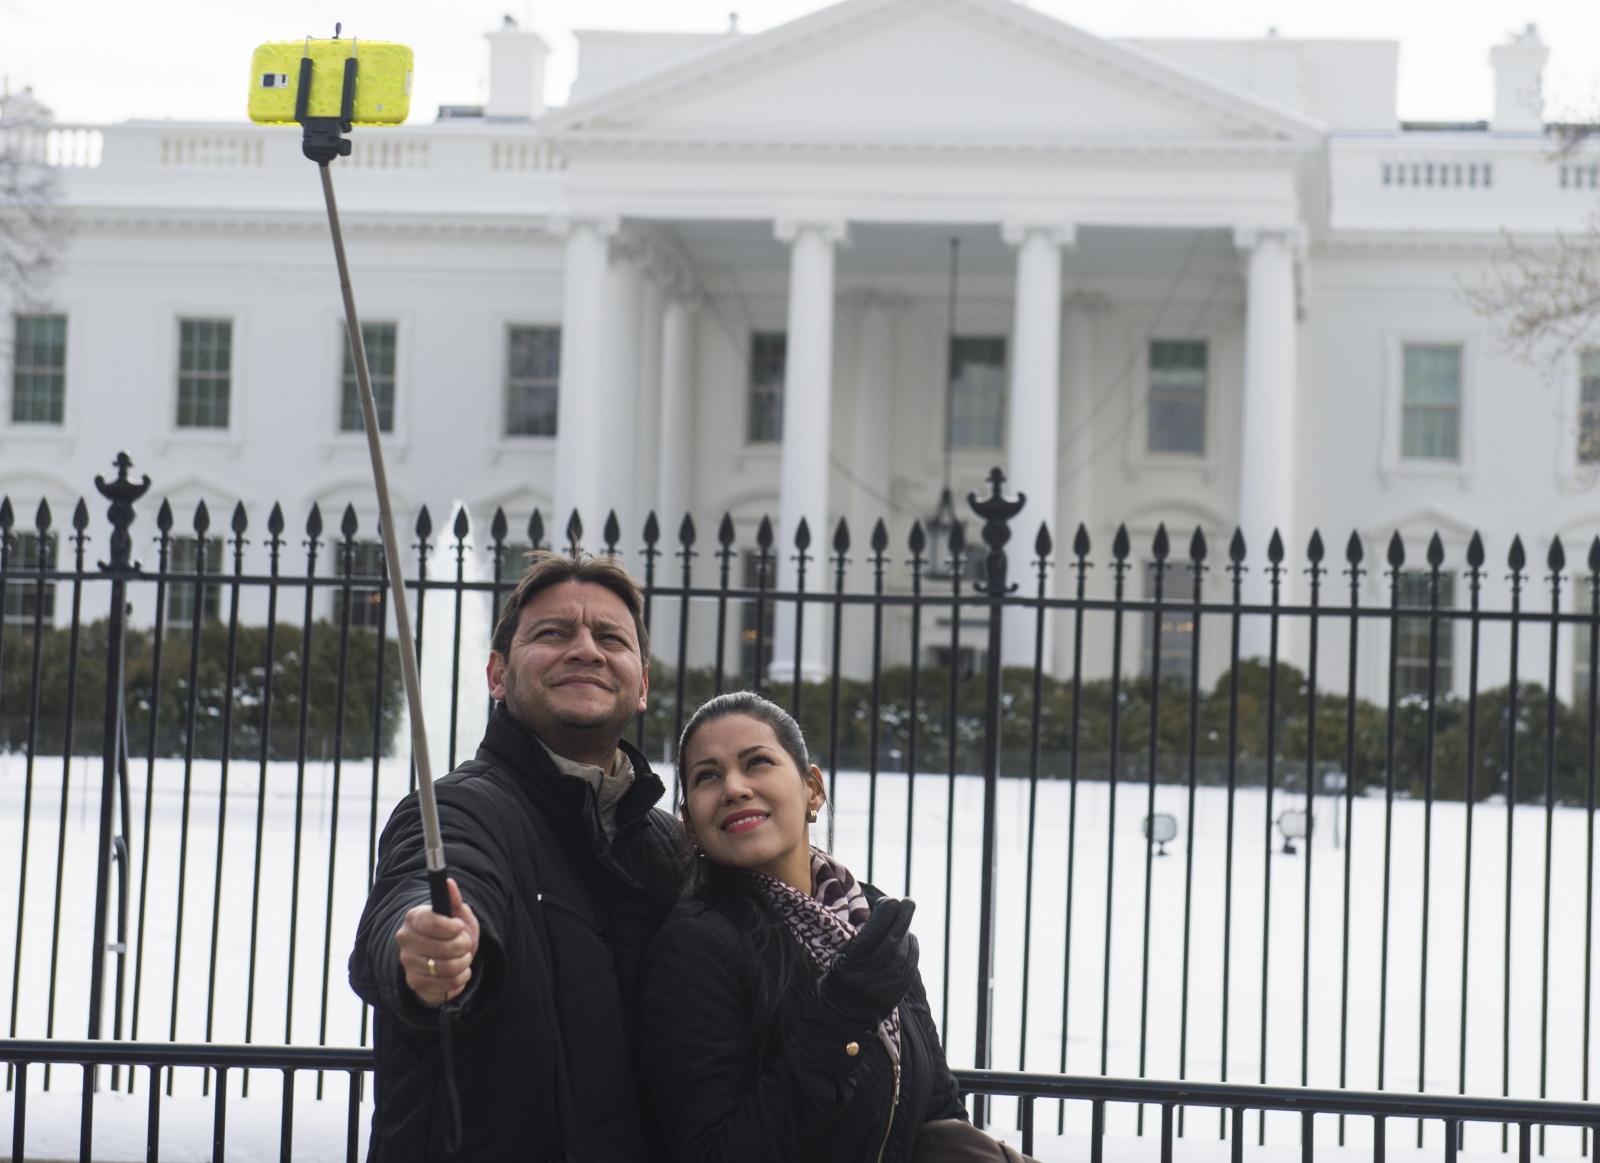 Tourists selfie stick